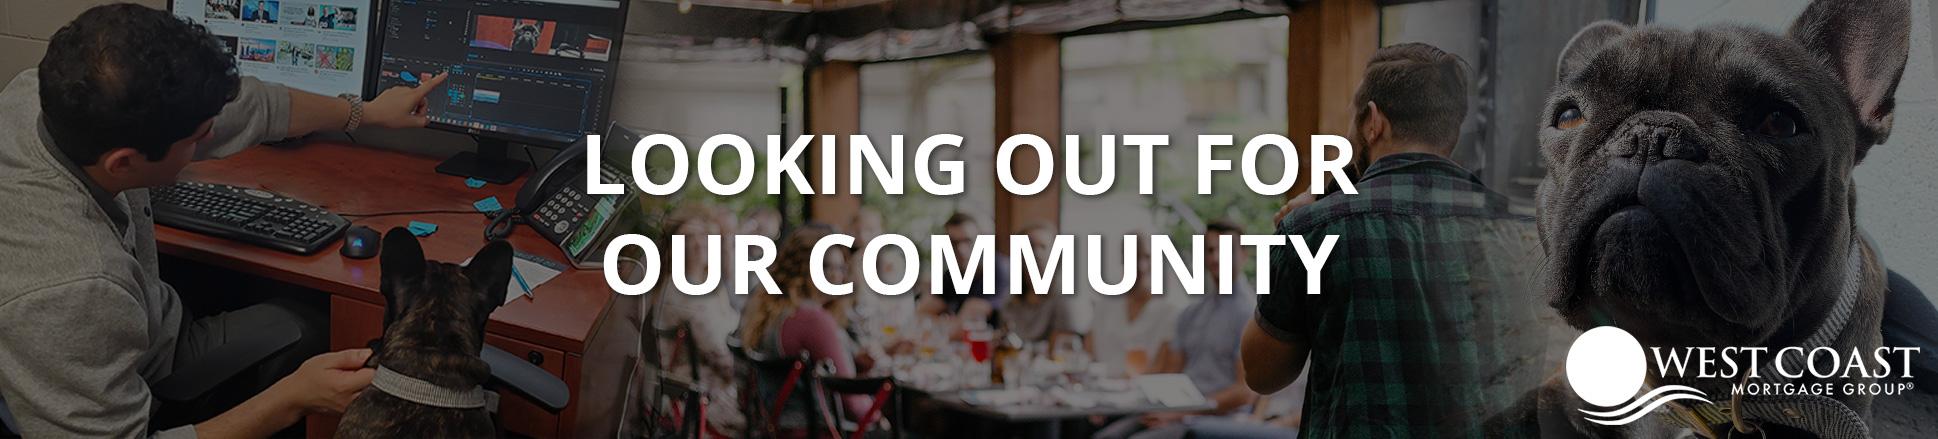 Community Contributions | West Coast Mortgage Group Sacramento, CA